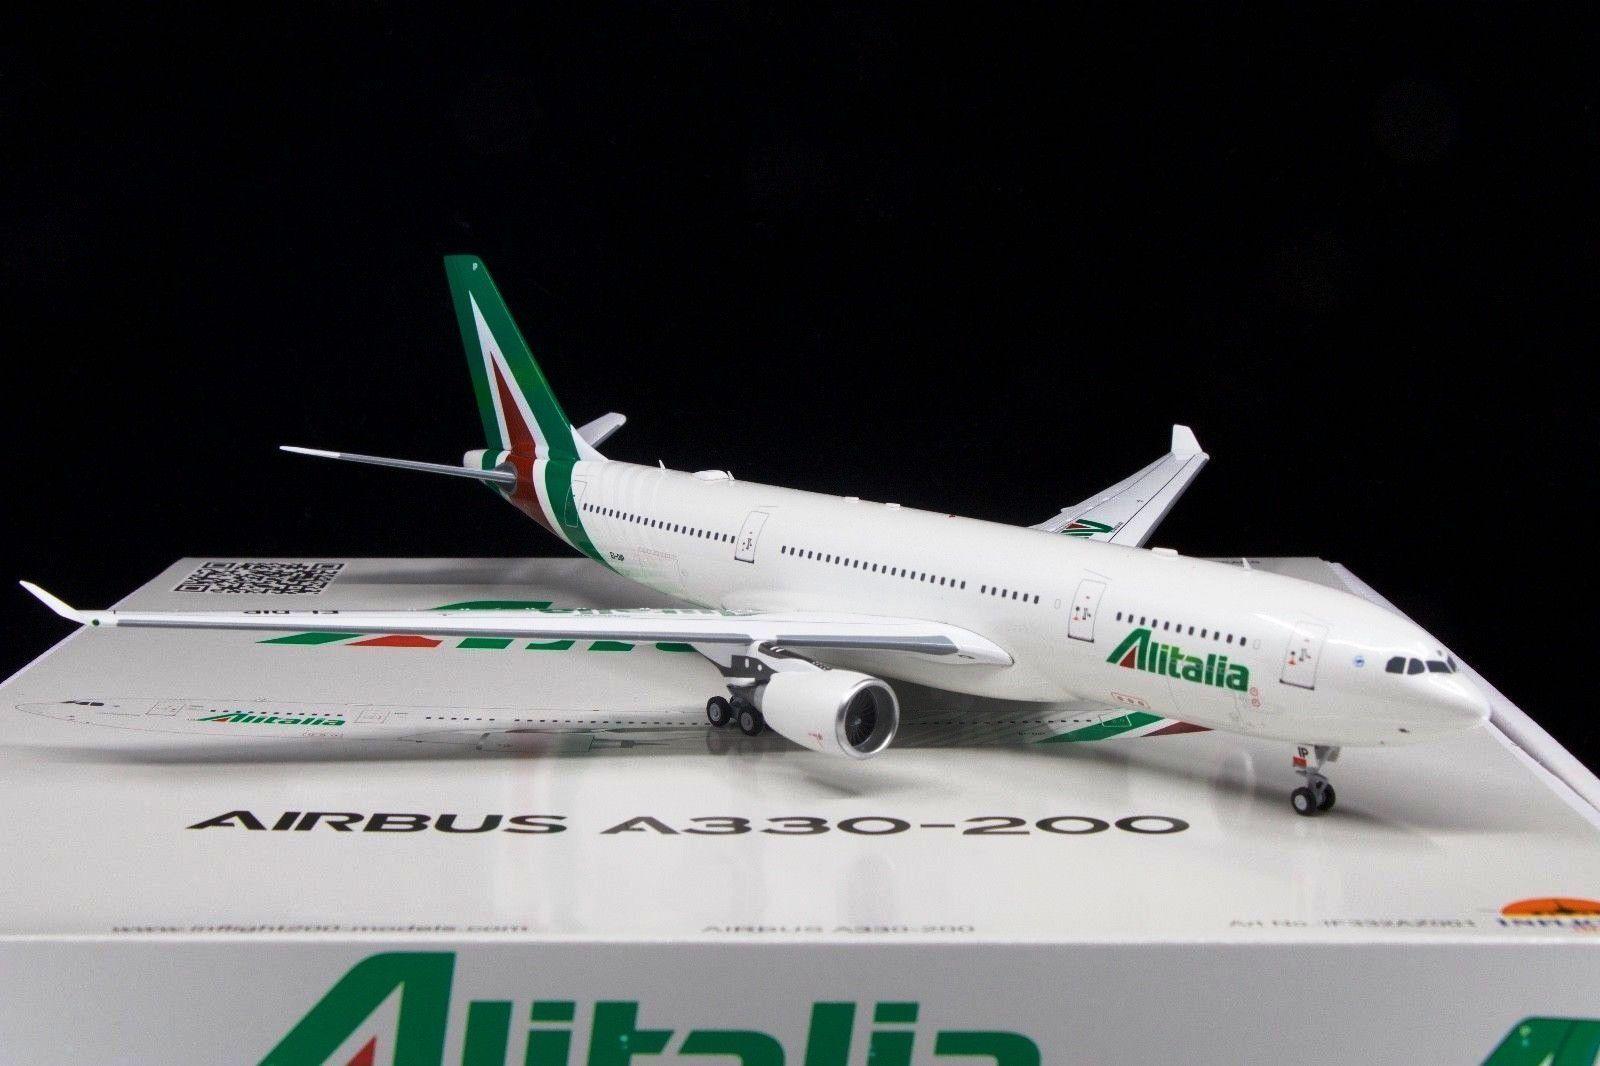 INFLIGHT 200 IF332AZ001 1 200 ALITALIA AIRBUS A330-200 EI-DIP WITH STAND